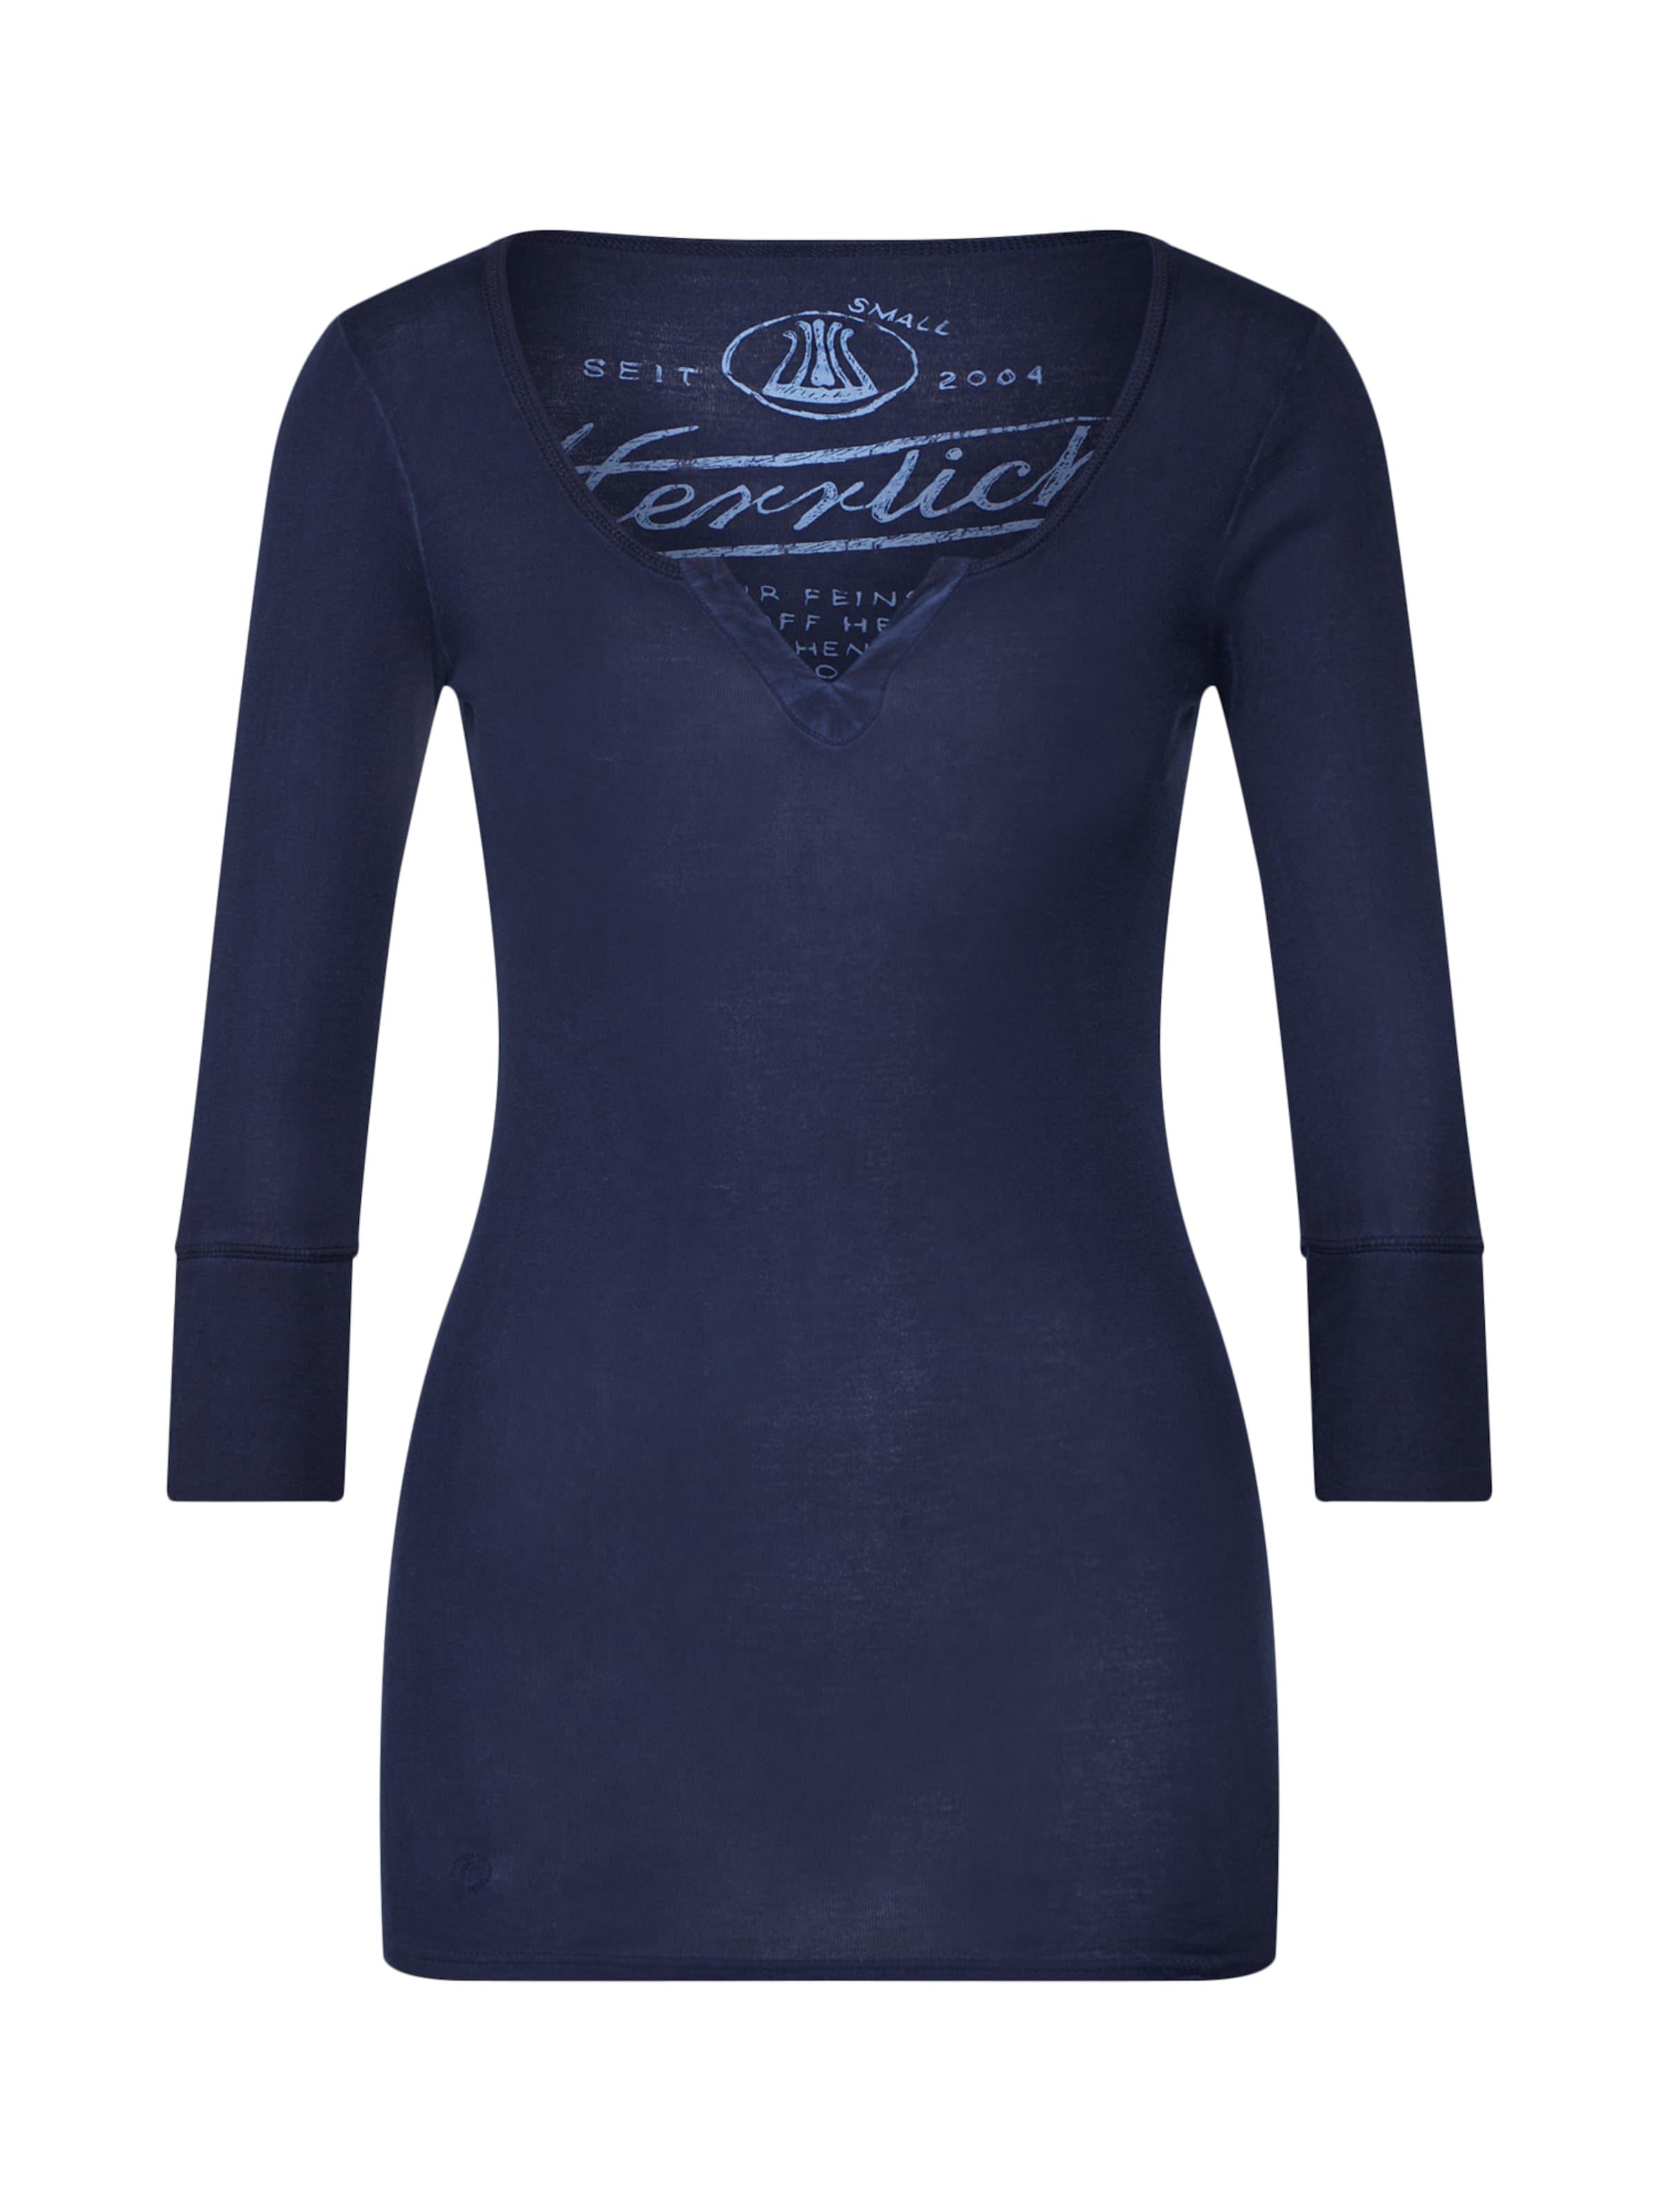 Herrlicher In Micro Rib' Blau 'safia Shirt Onvm8N0w